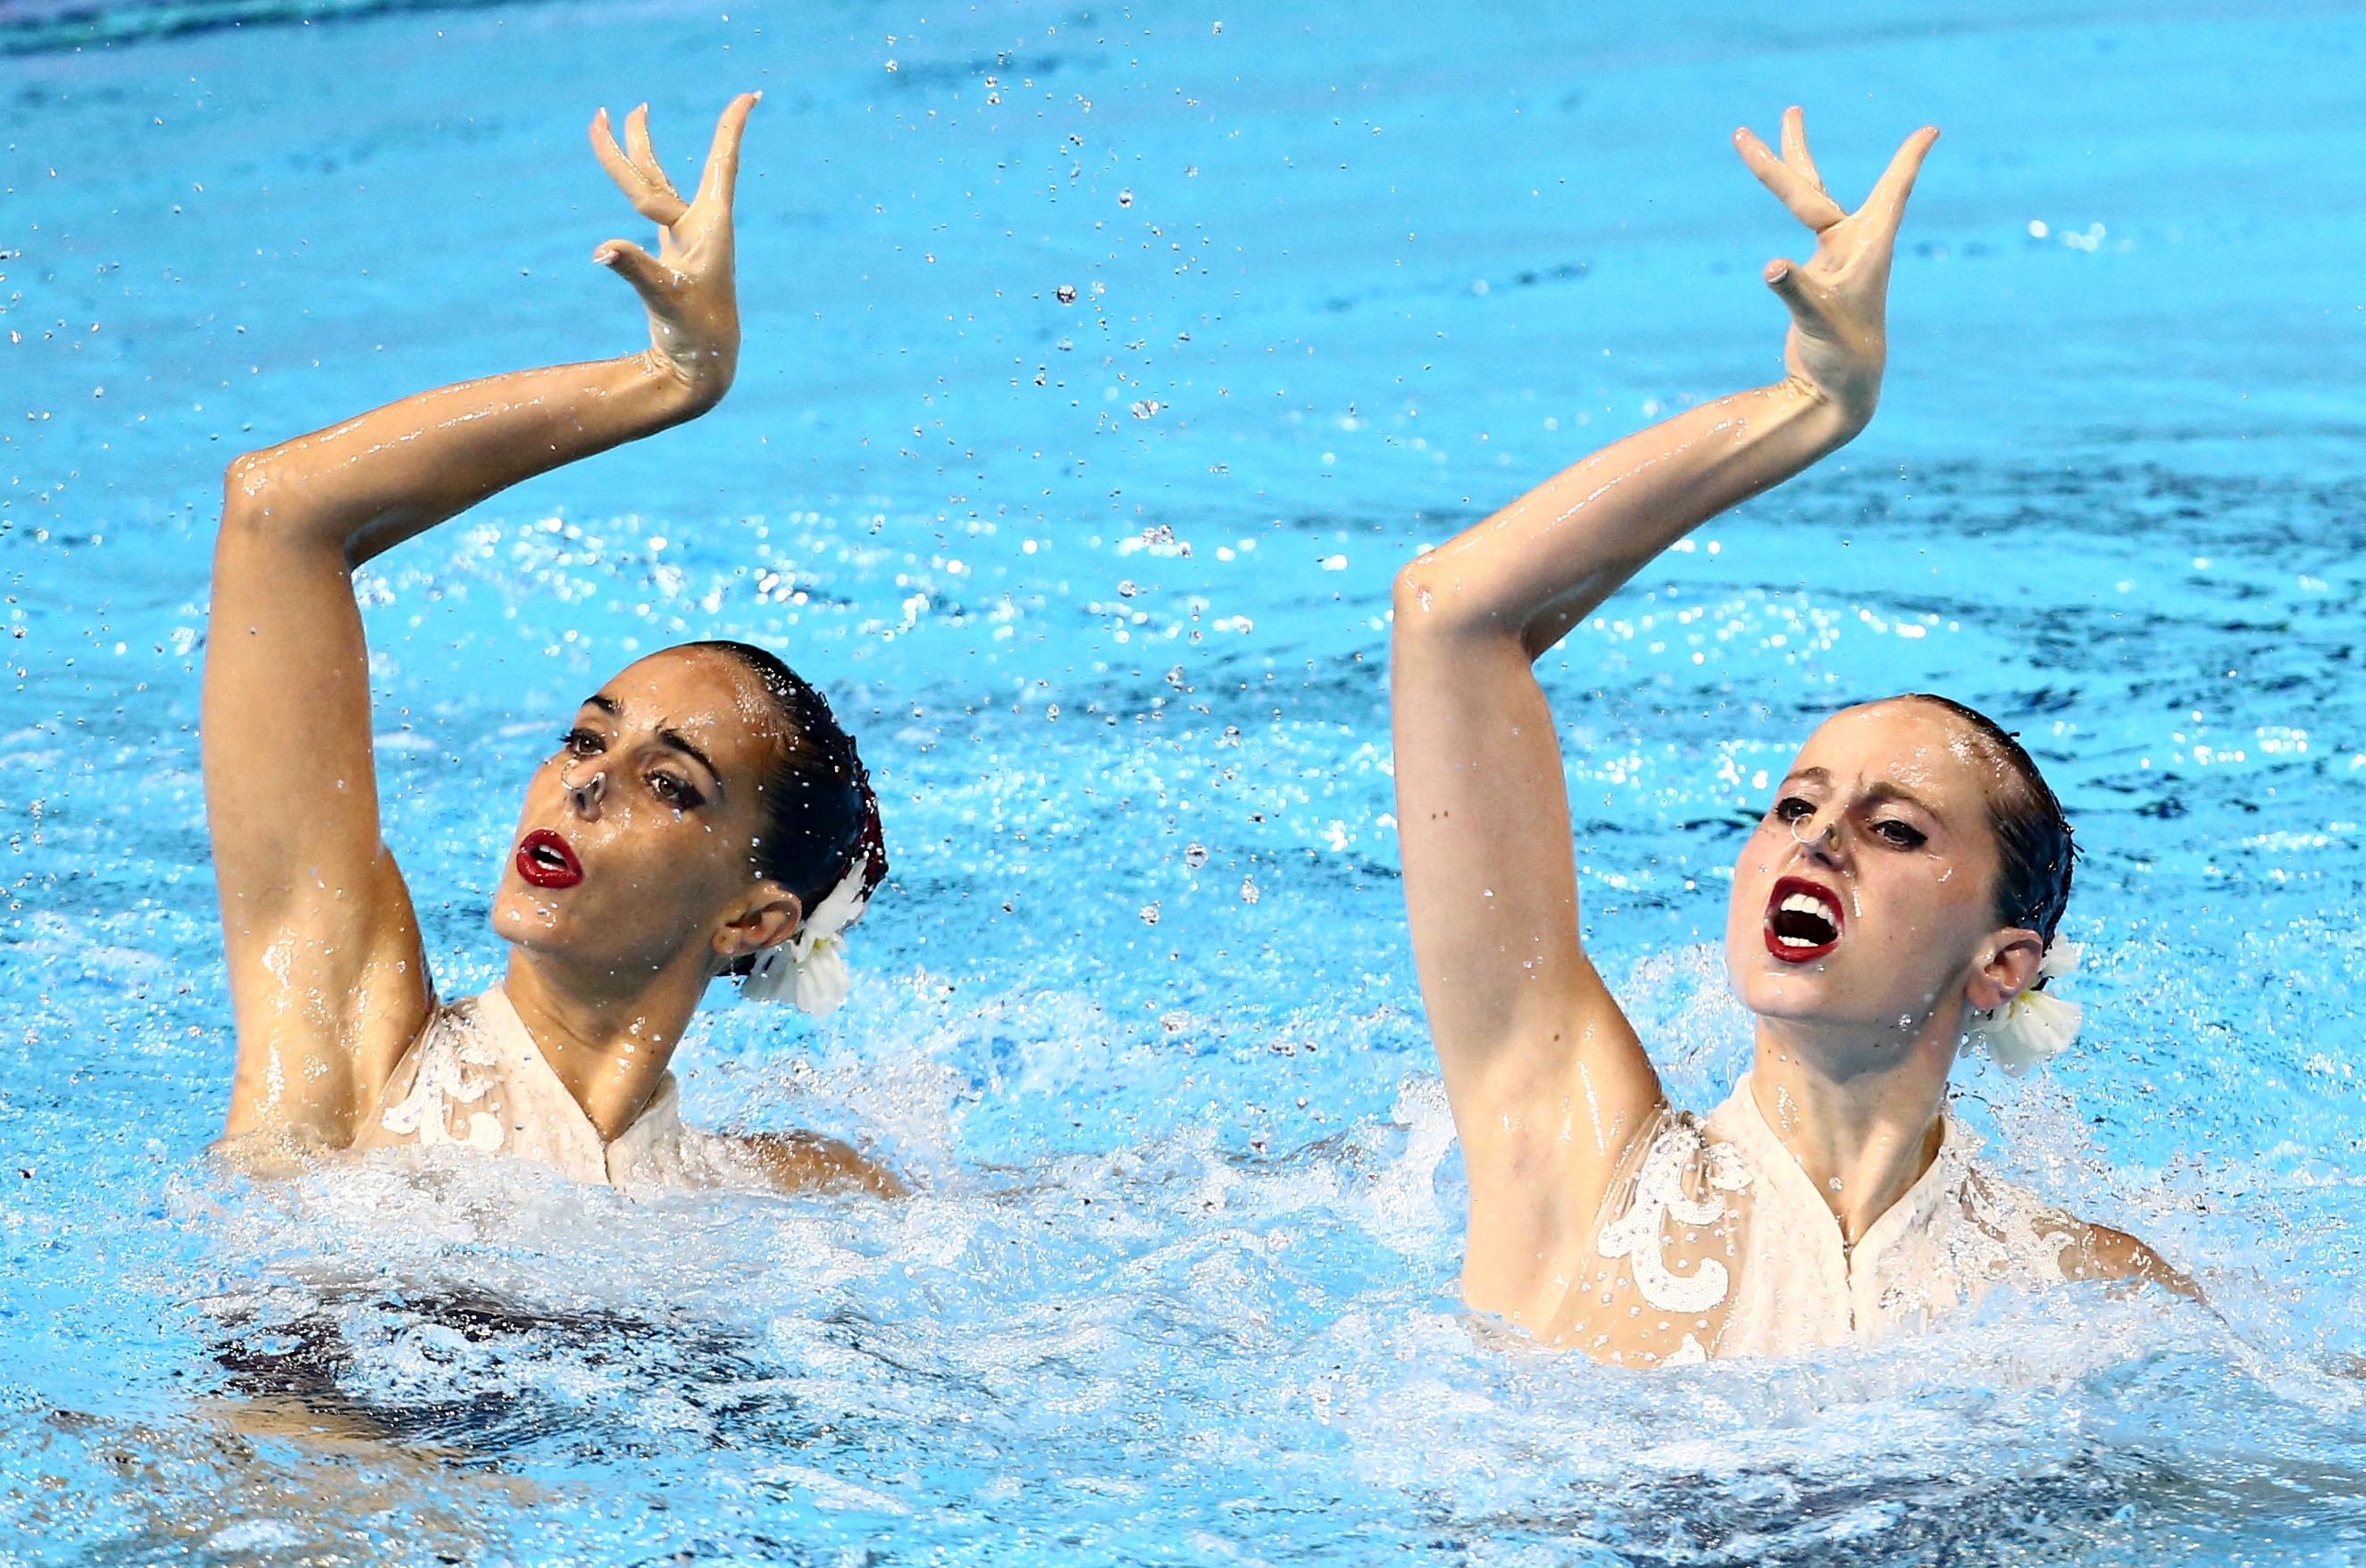 Swimming - 18th FINA World Swimming Championships - Women's Duet Free Final - Yeomju Gymnasium, Gwangju, South Korea - July 18, 2019.  Ona Carbonell and Paula Ramirez of Spain compete. REUTERS/Antonio Bronic/File Photo